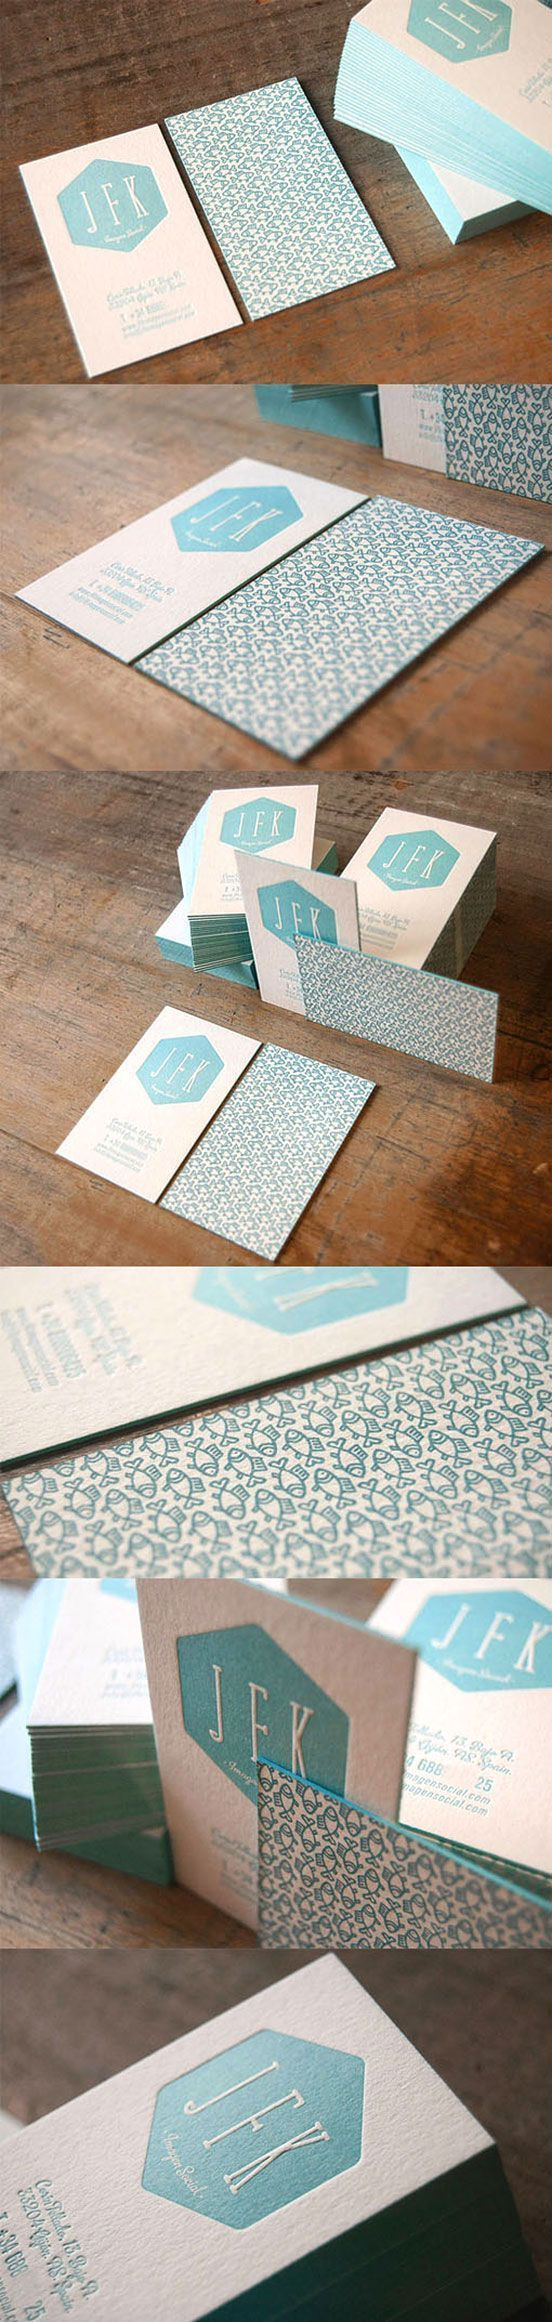 Painted Letterpress Business Card #BestBusinessCards #BusinessCardMaker